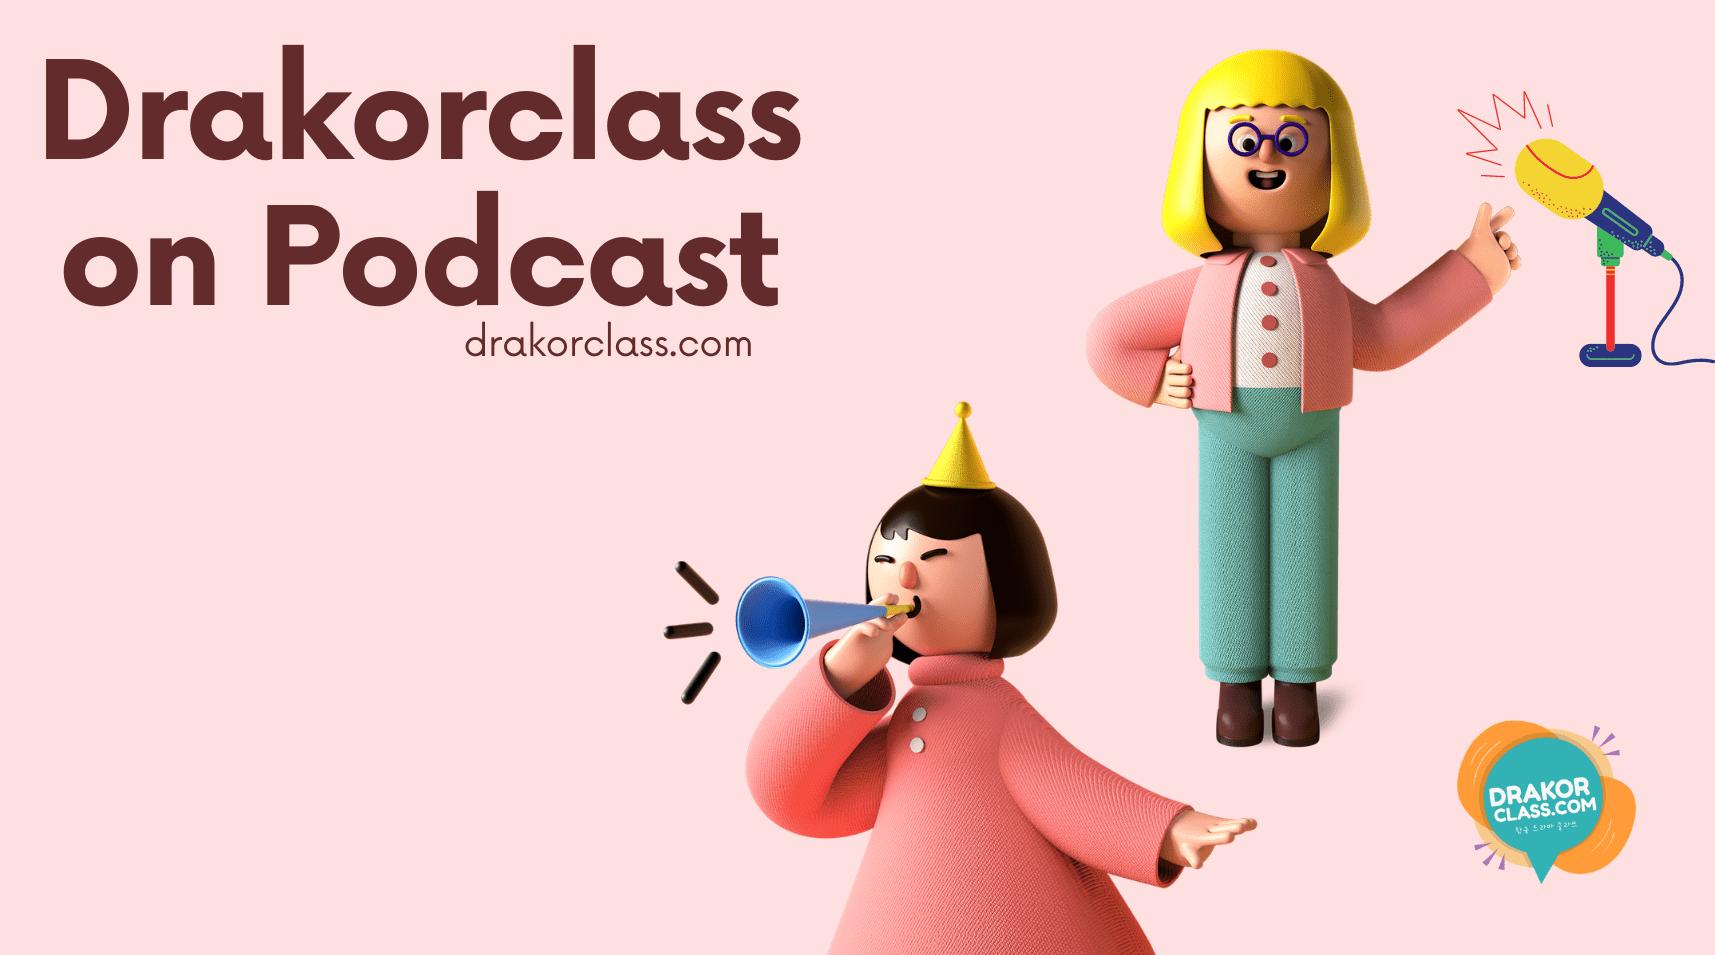 Podcast Drakorclass